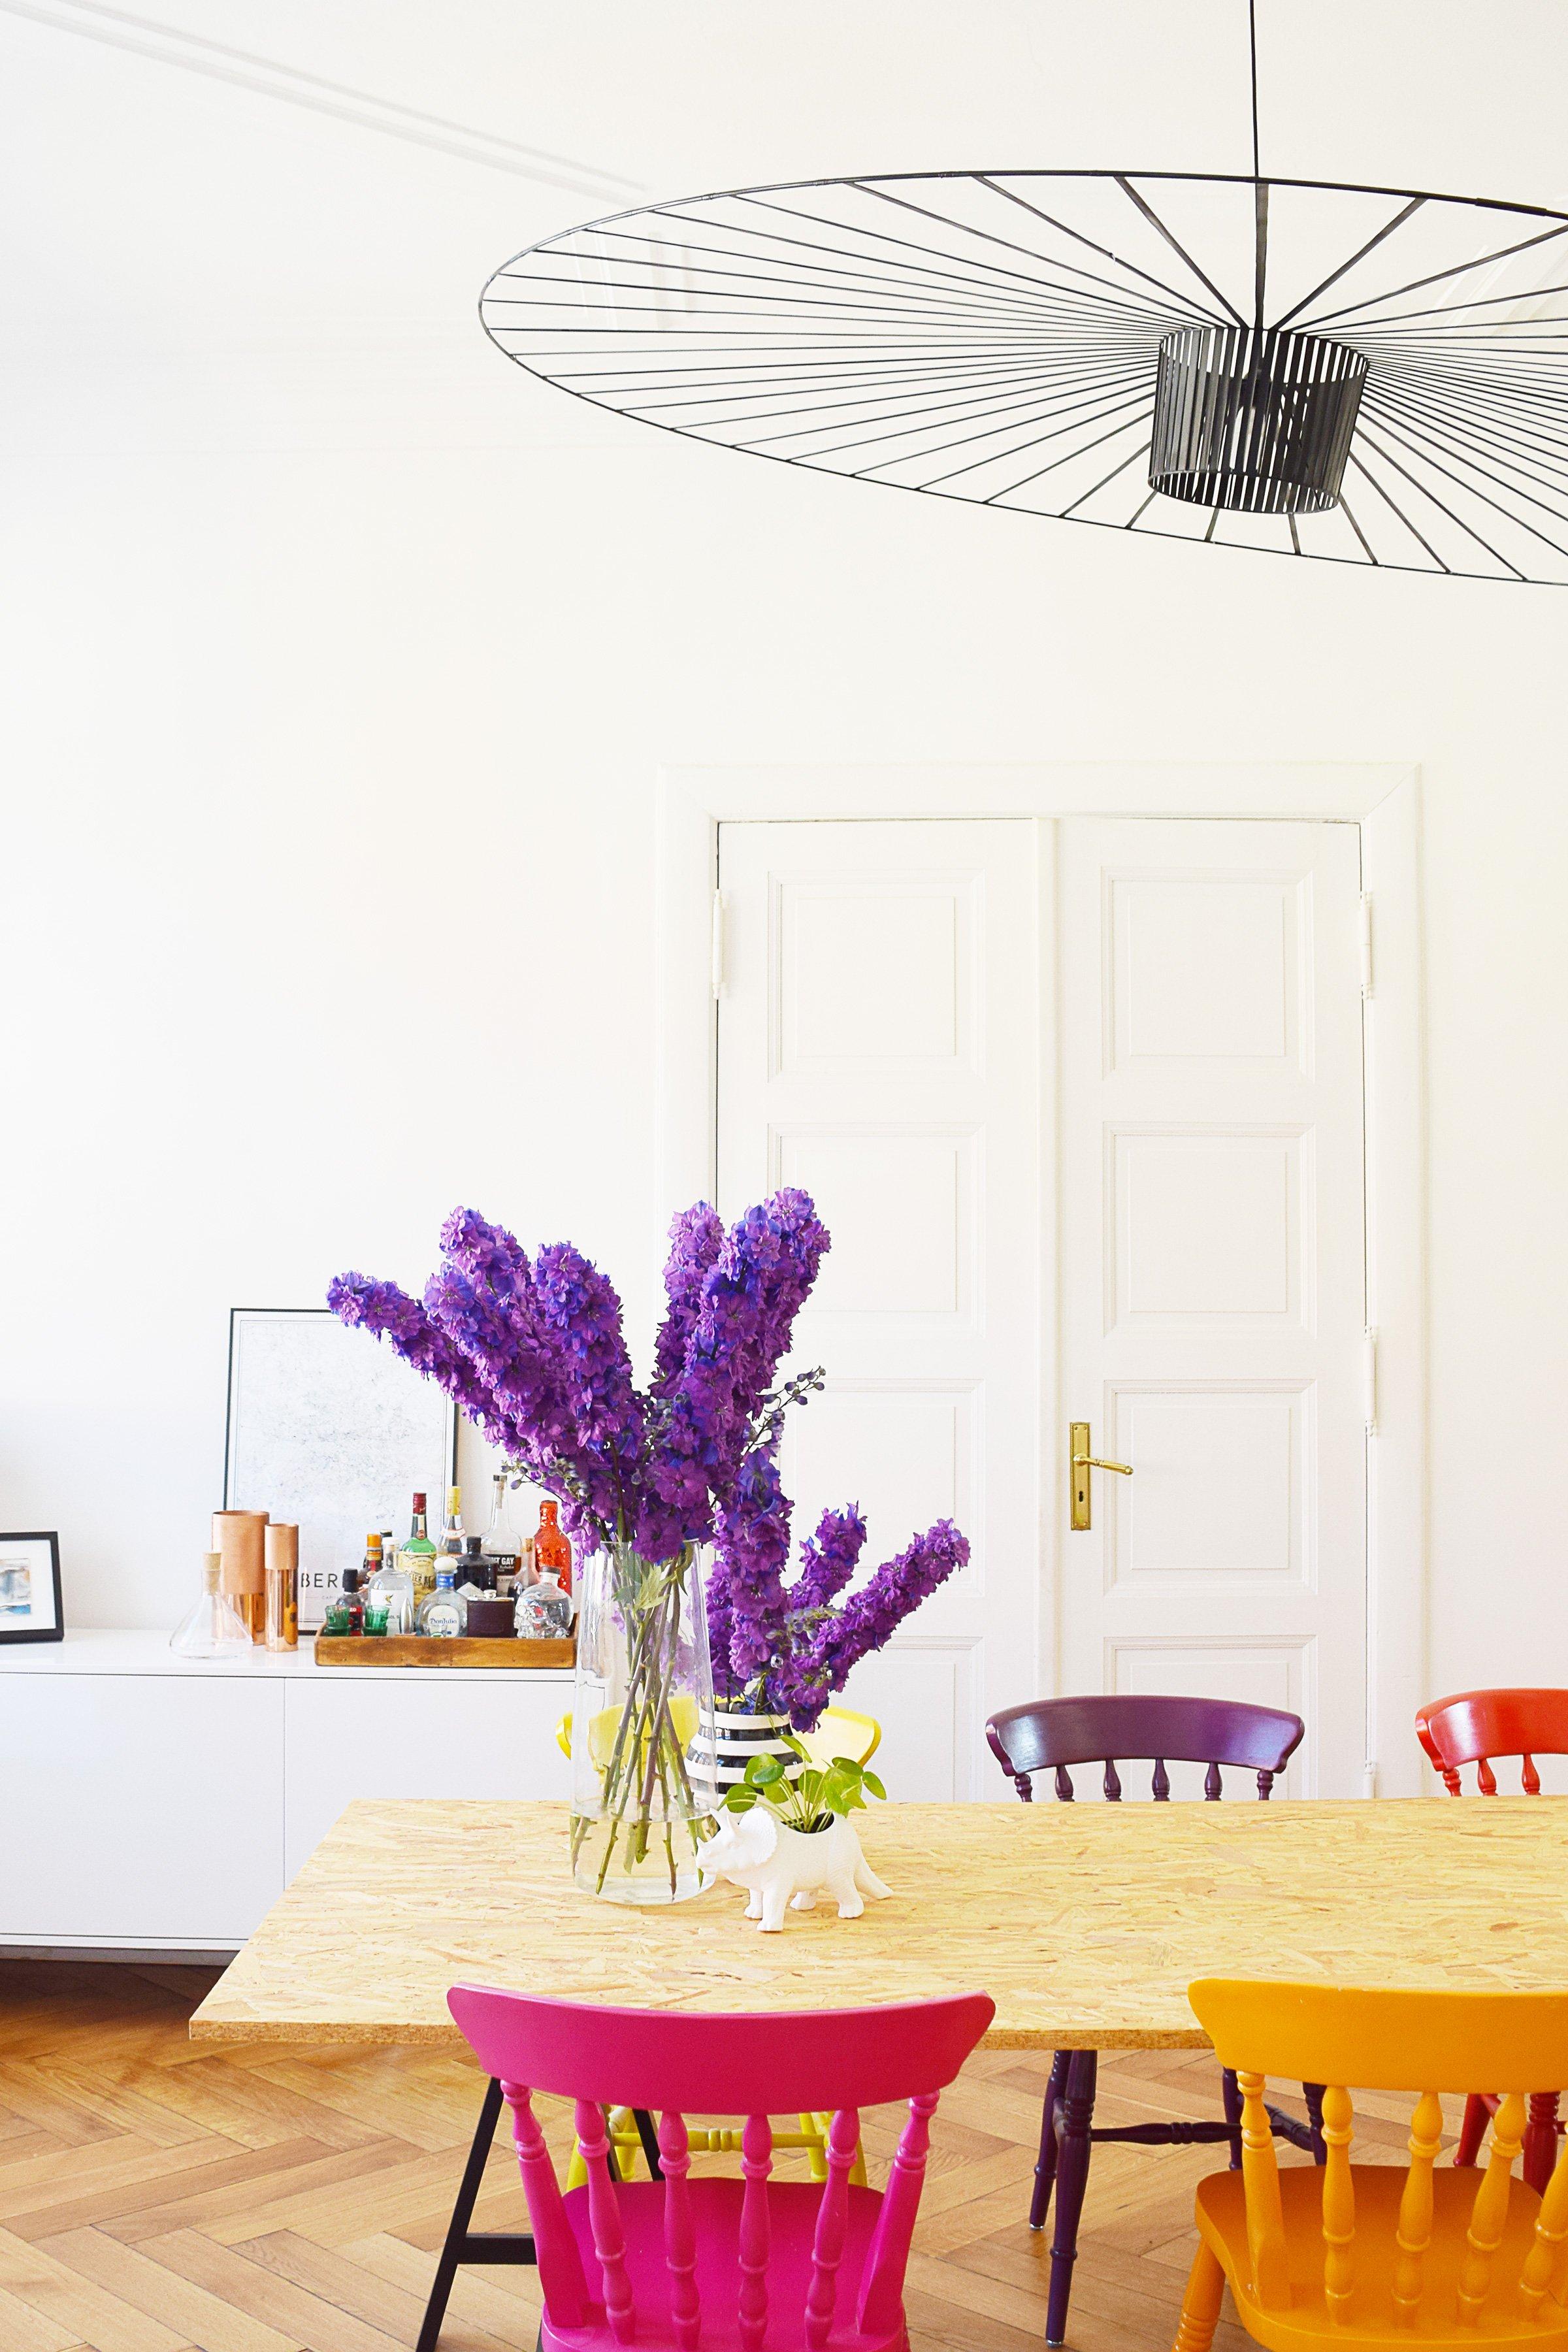 Dining Room Makeover Plans | Little House On The Corner